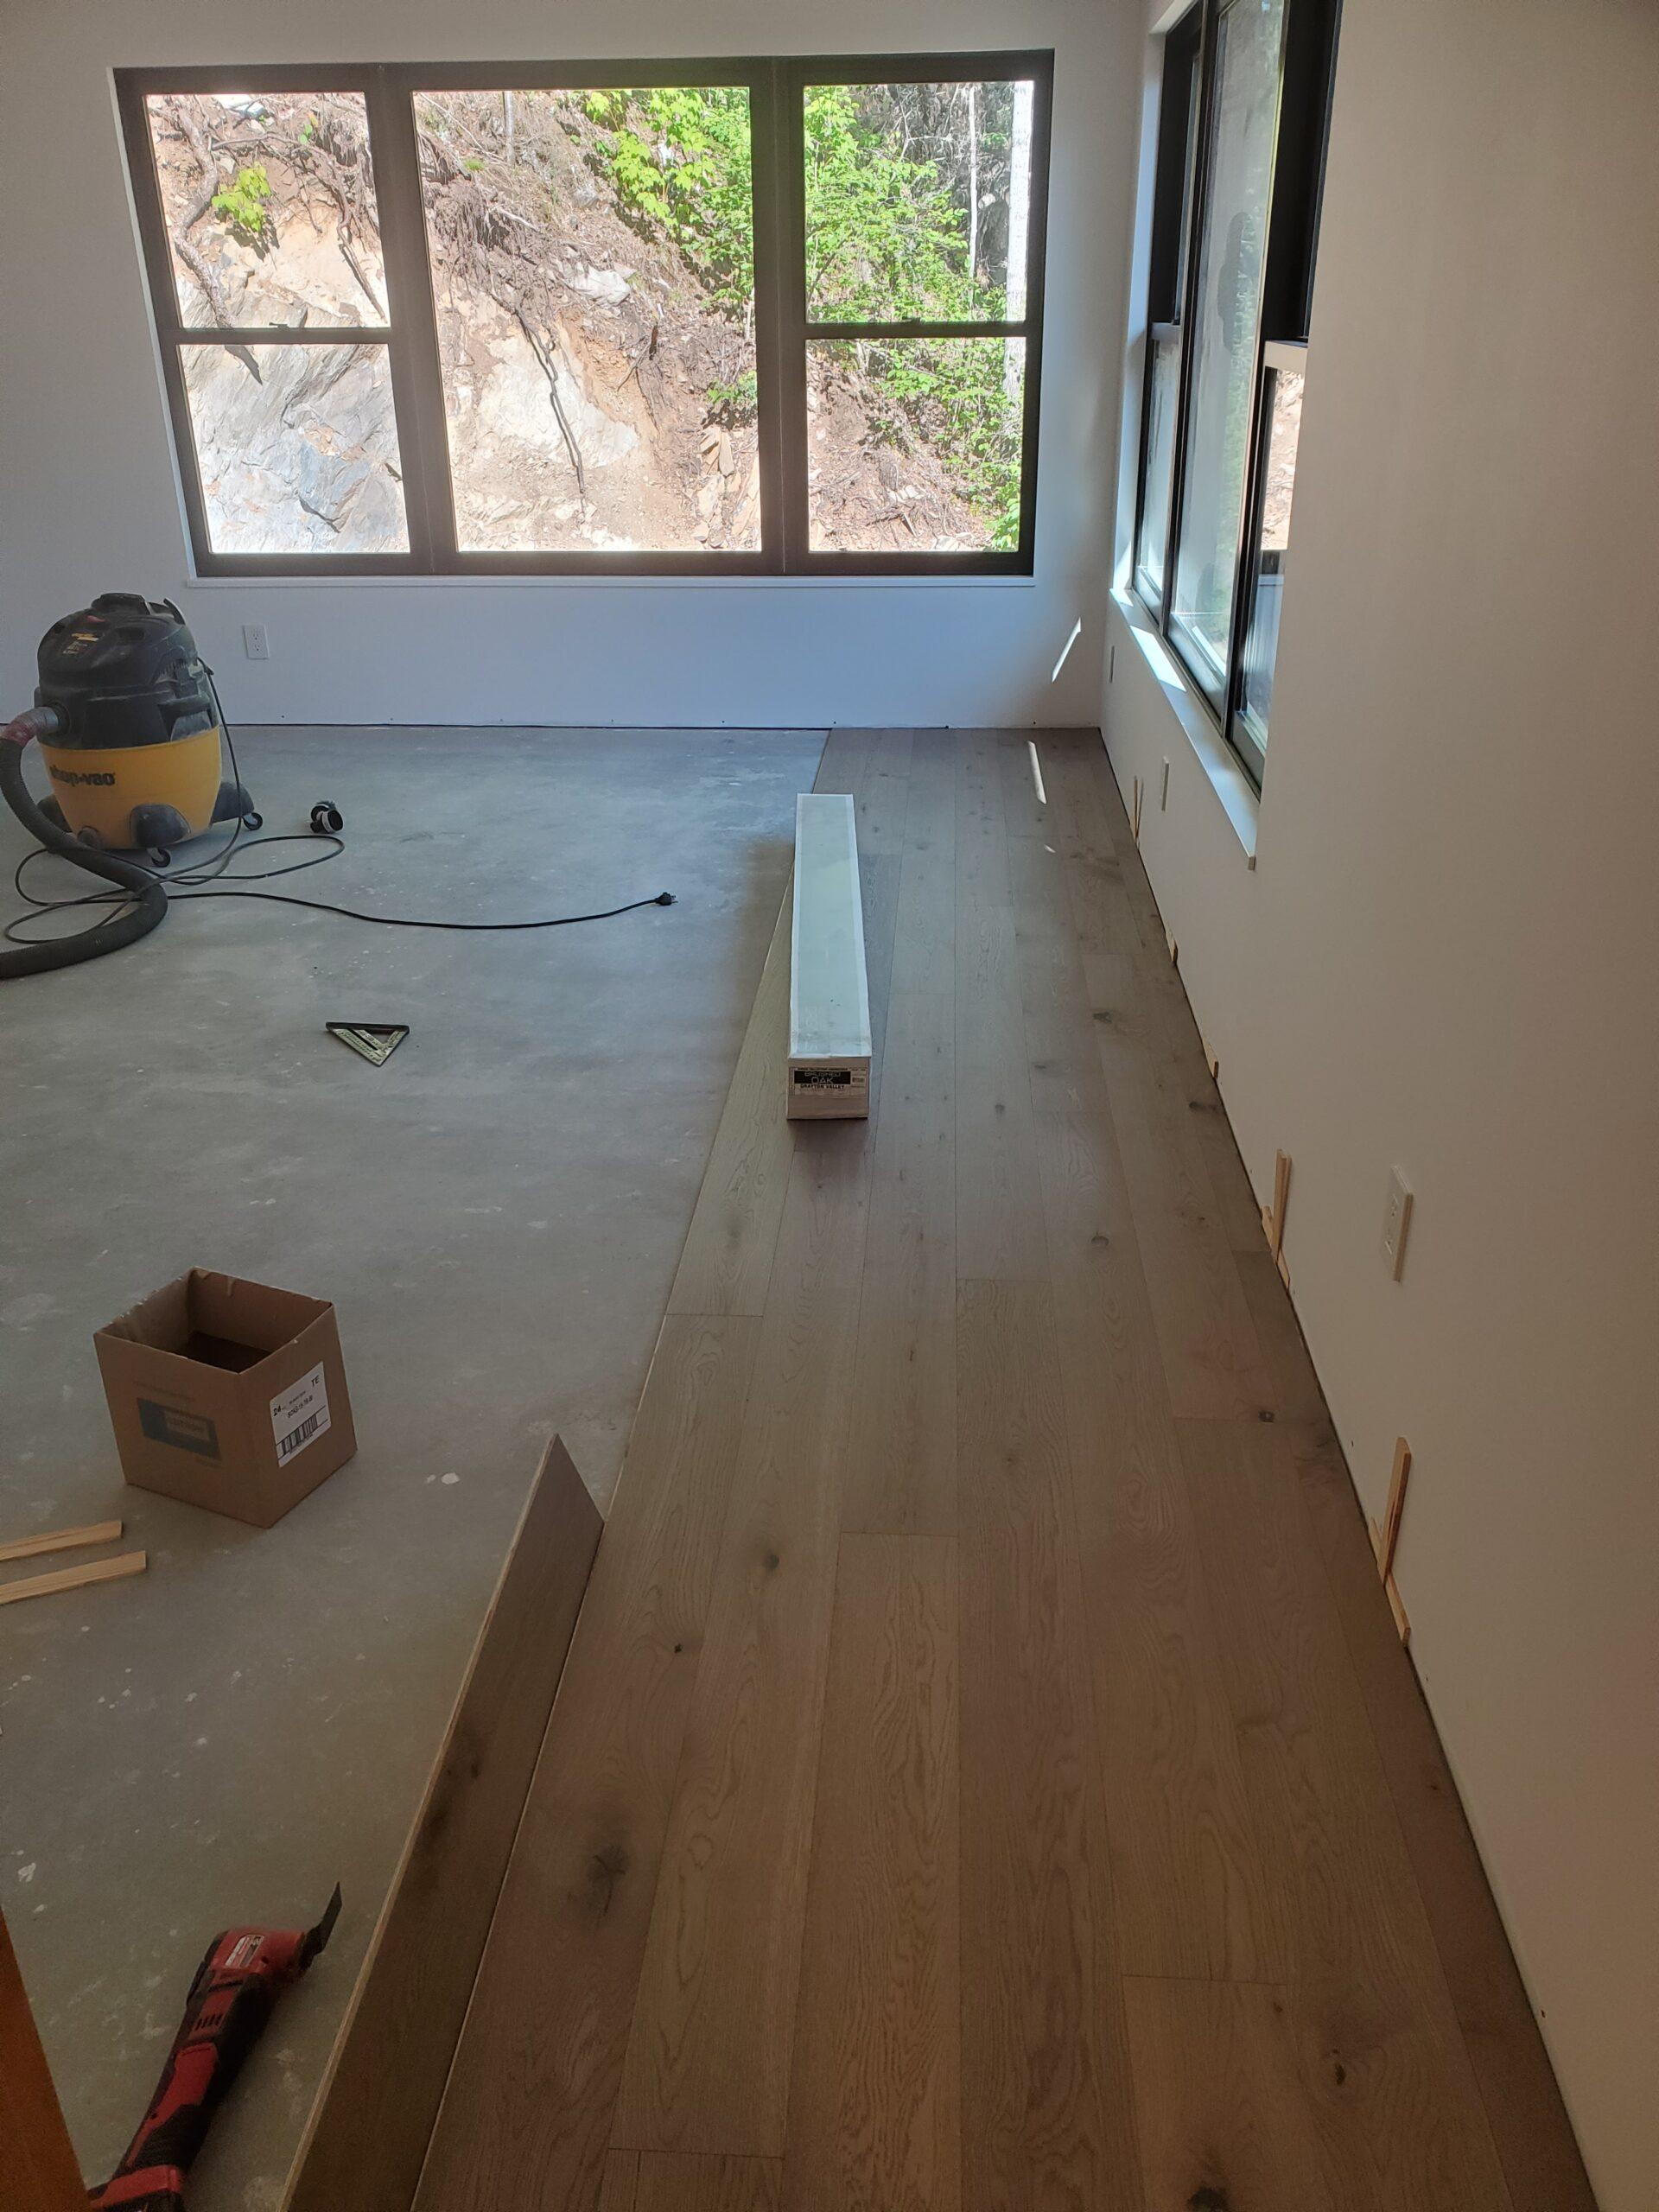 Hardwood Flooring in progress